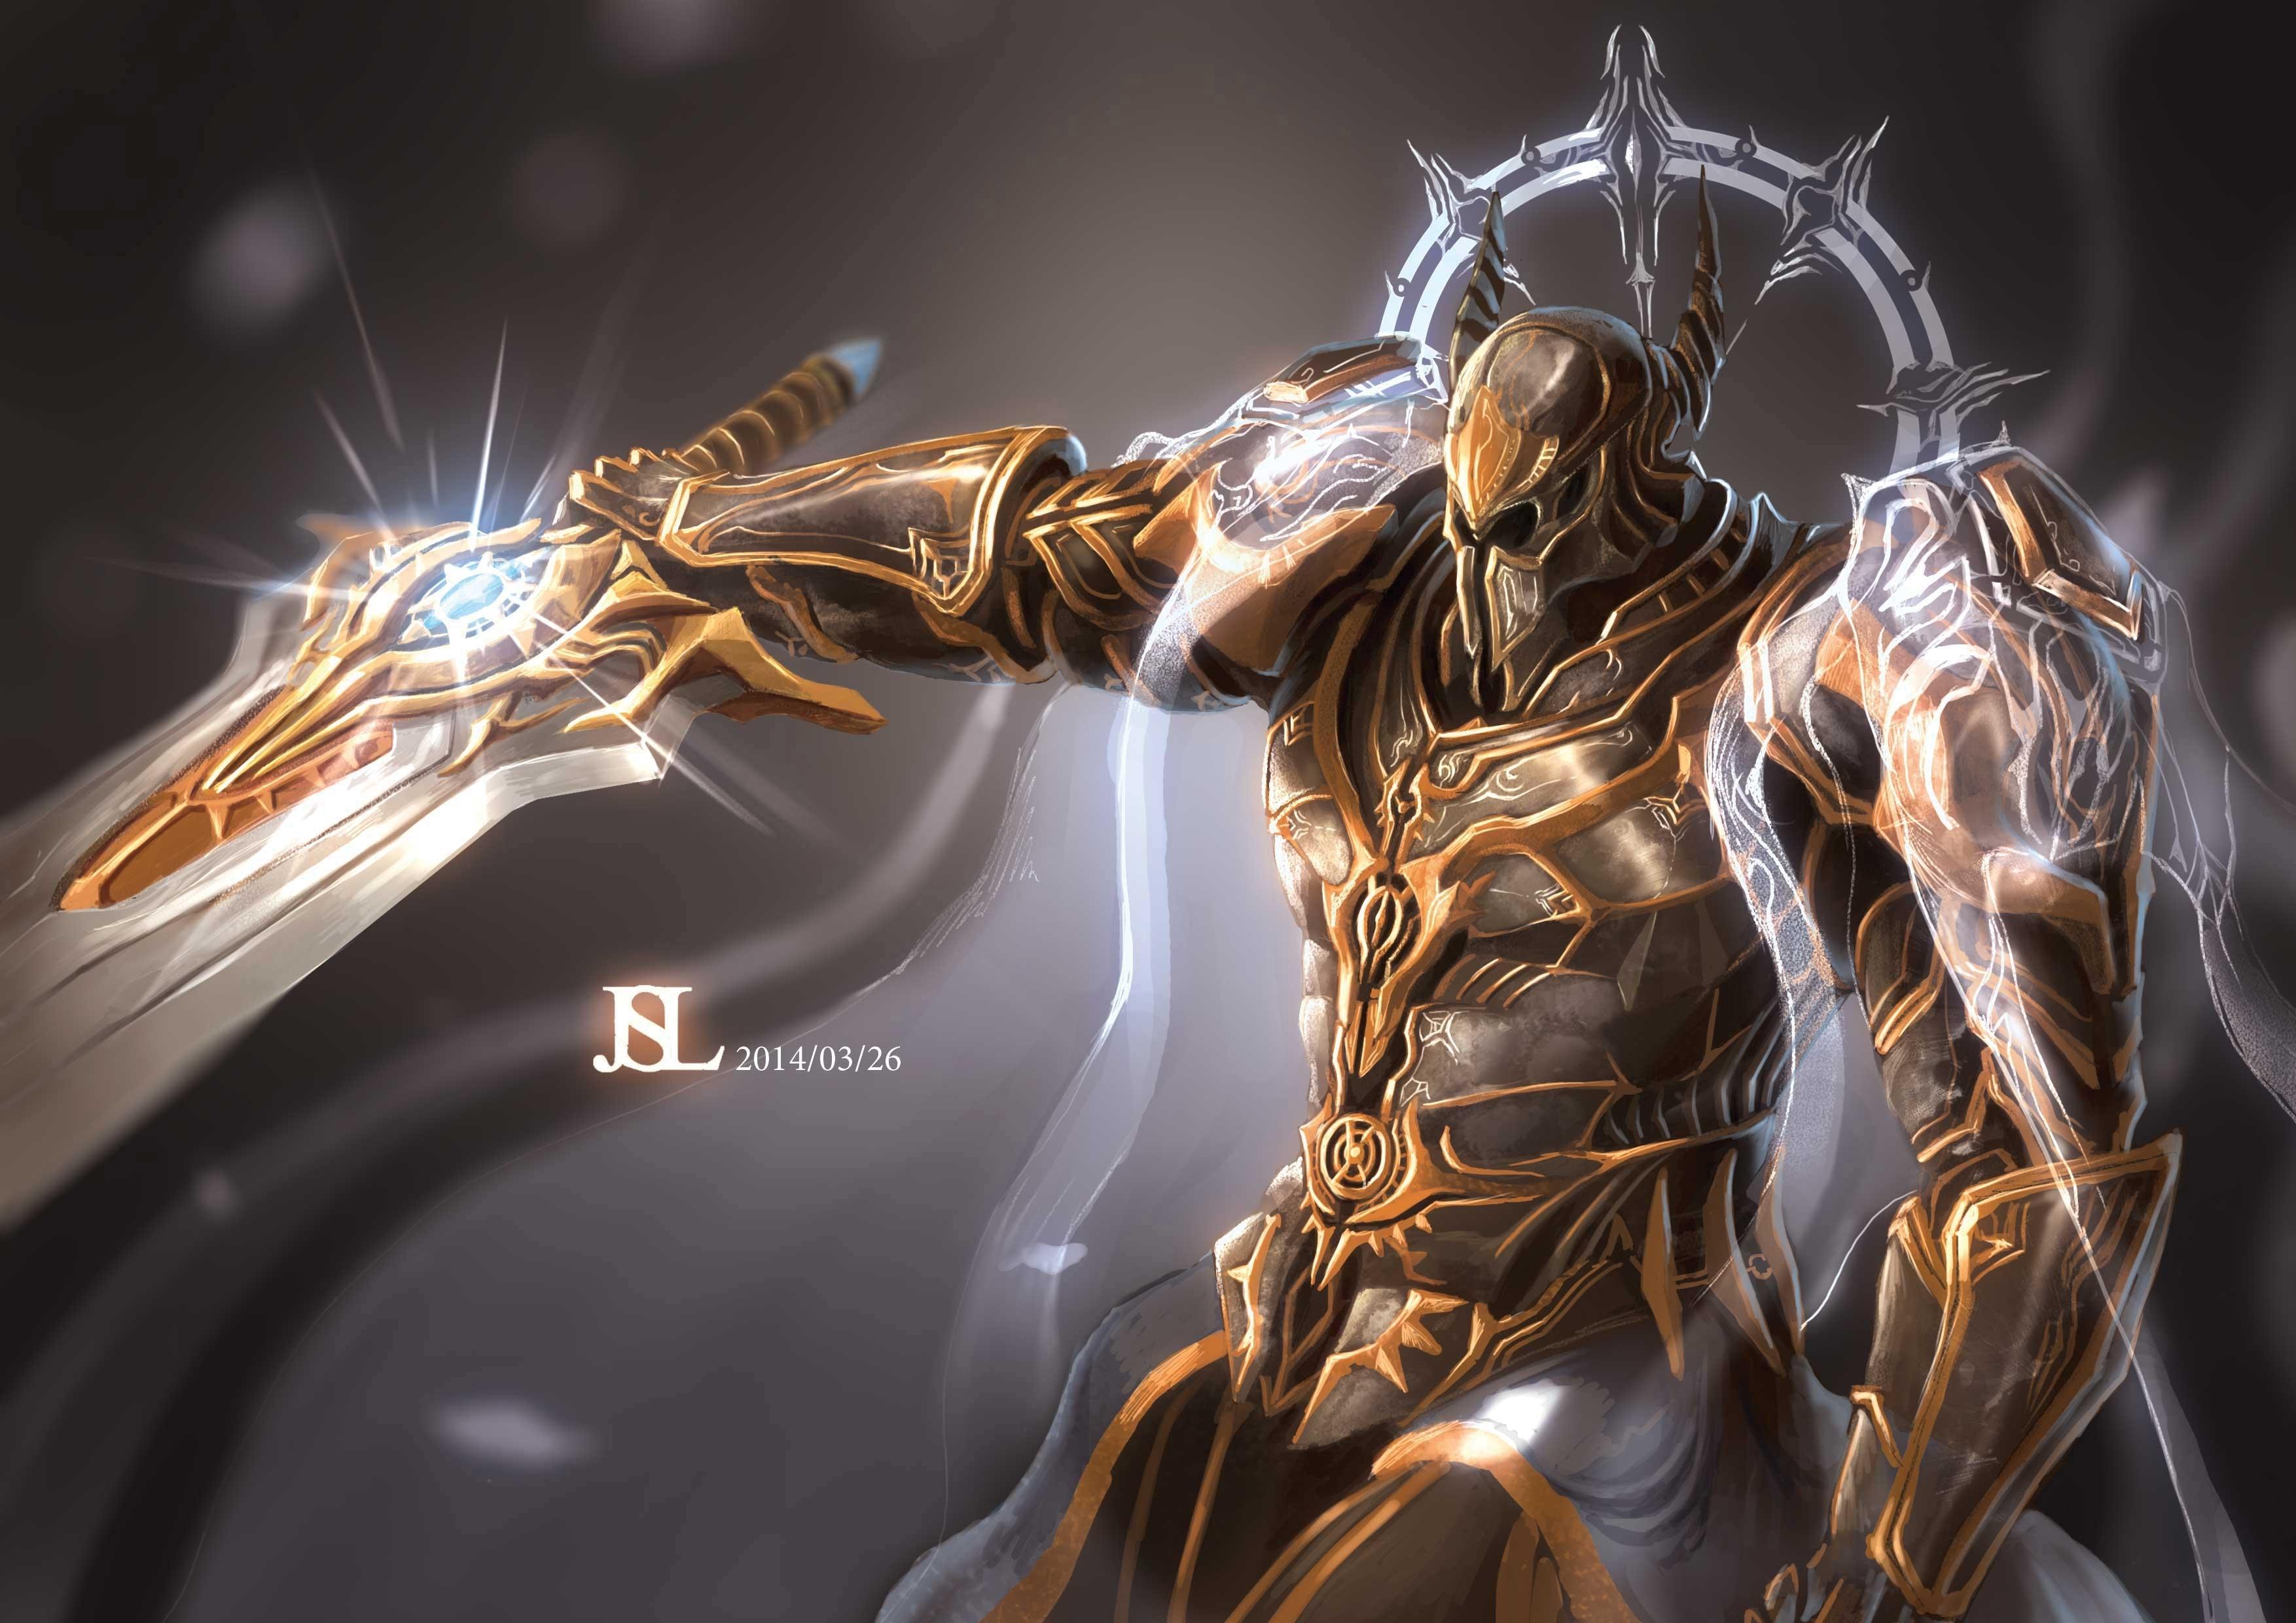 Diablo 3 Archangel Armor Sword